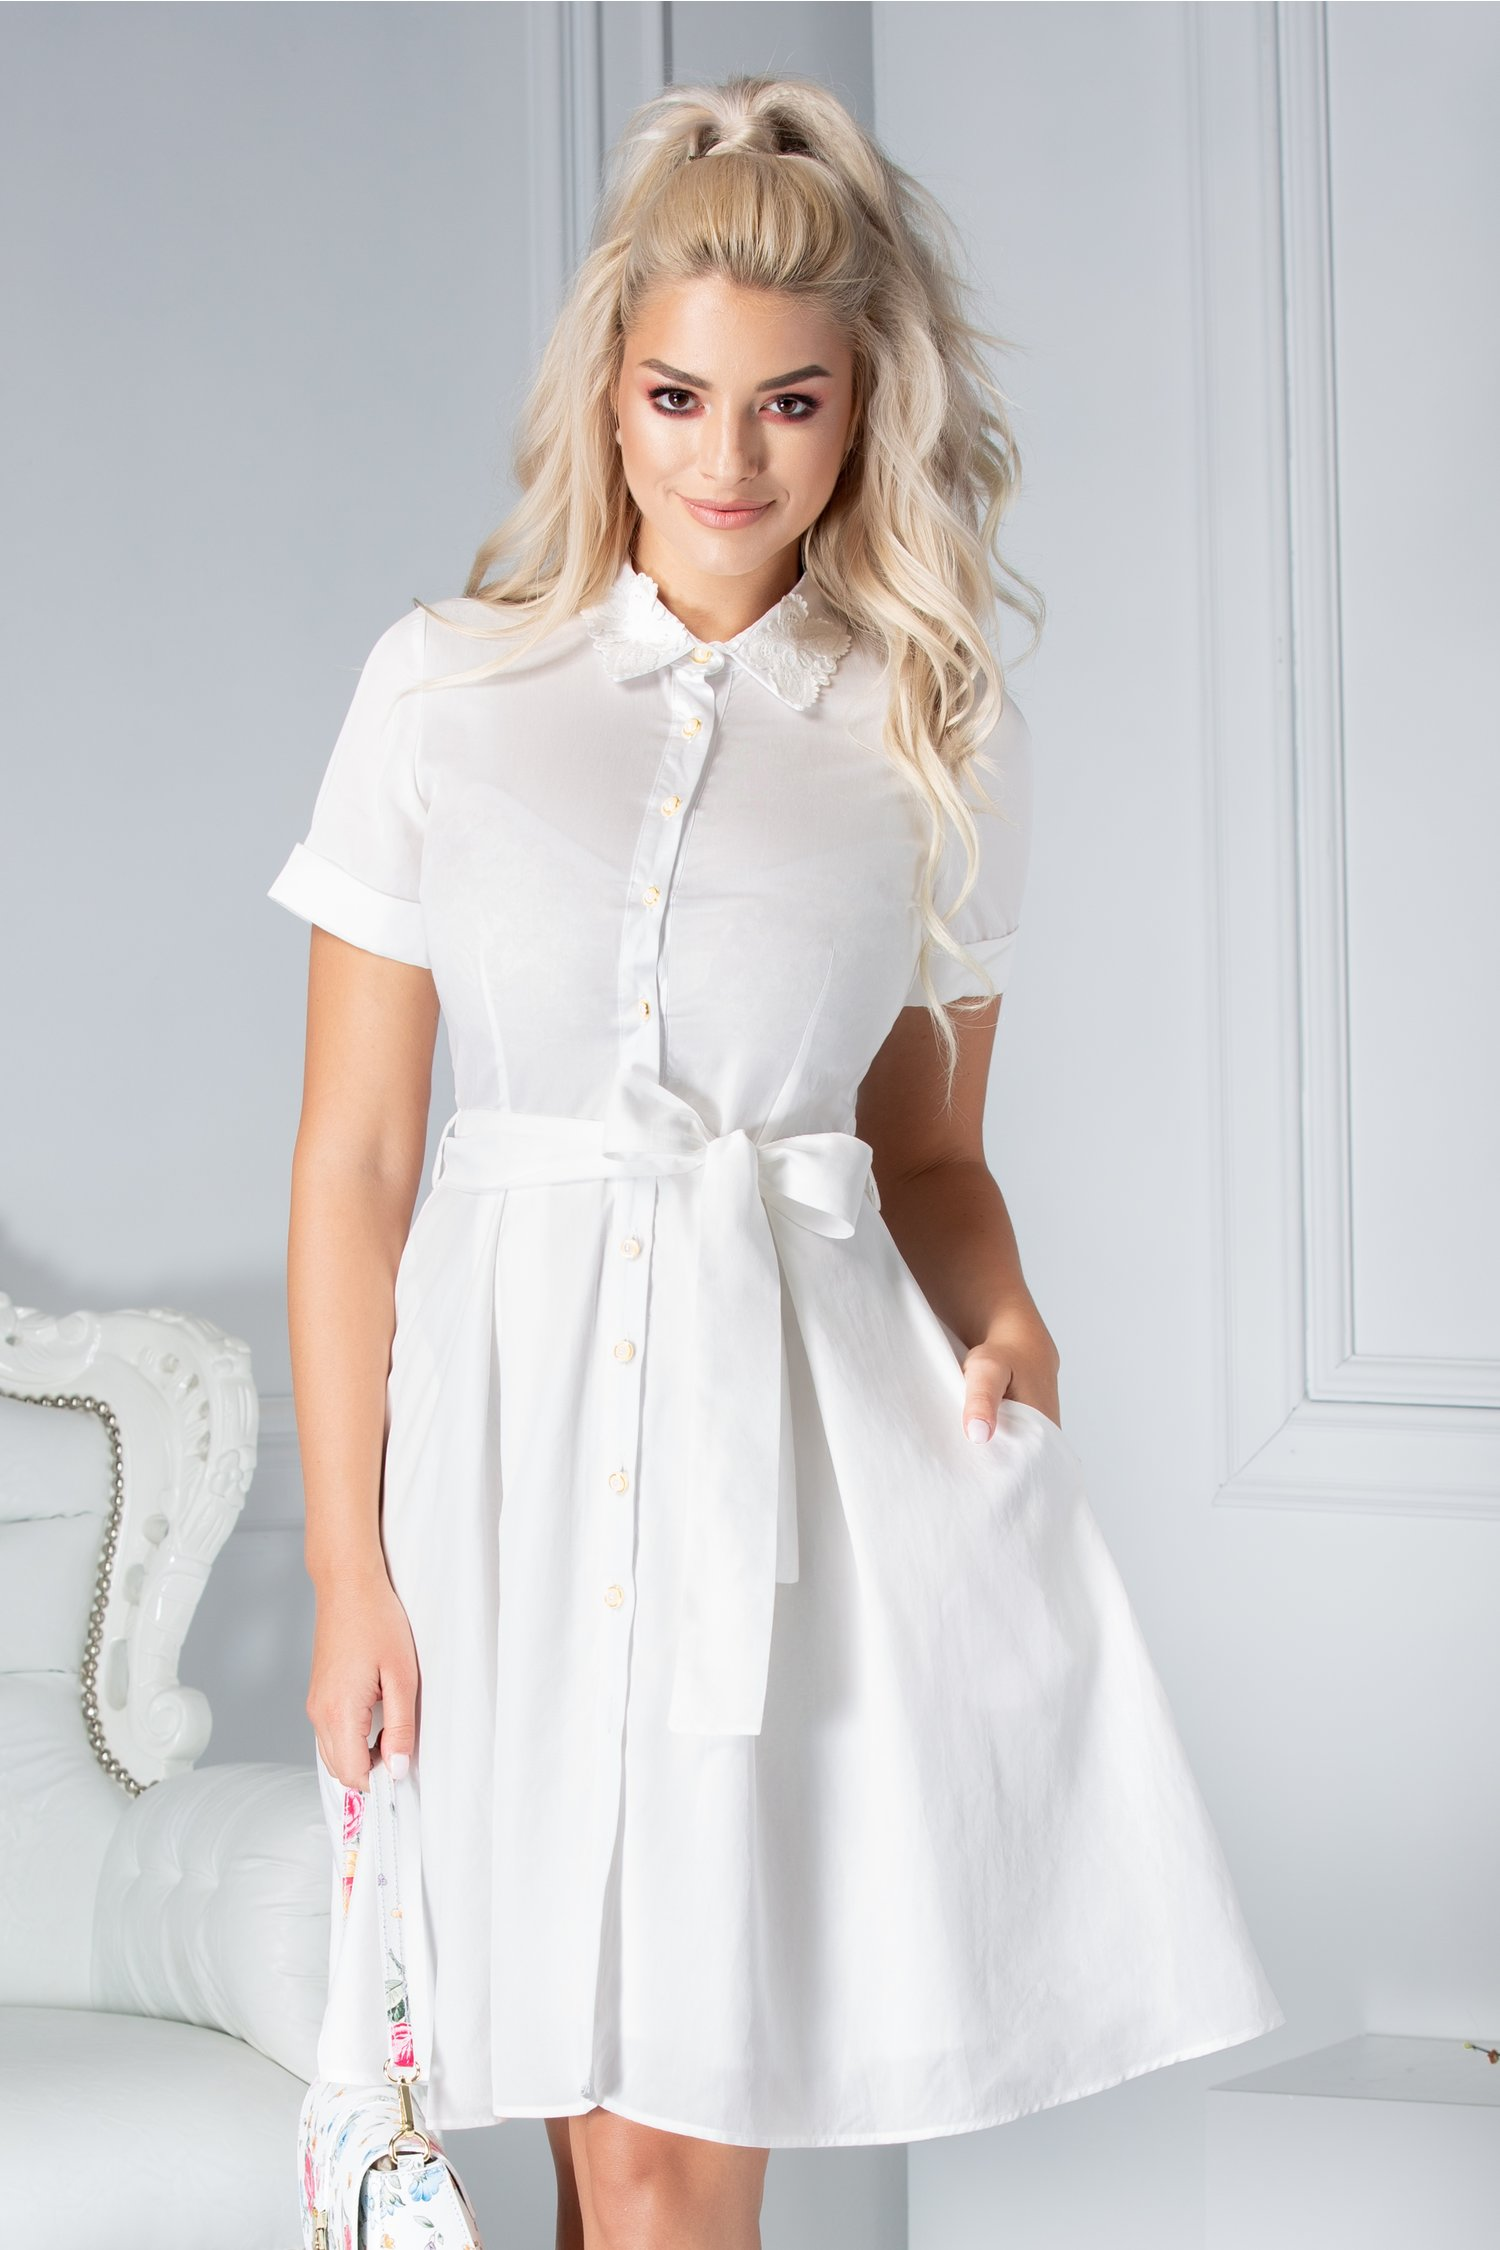 Rochie Pretty Girl Dalma alba stil camasa cu fluturi brodati la guler